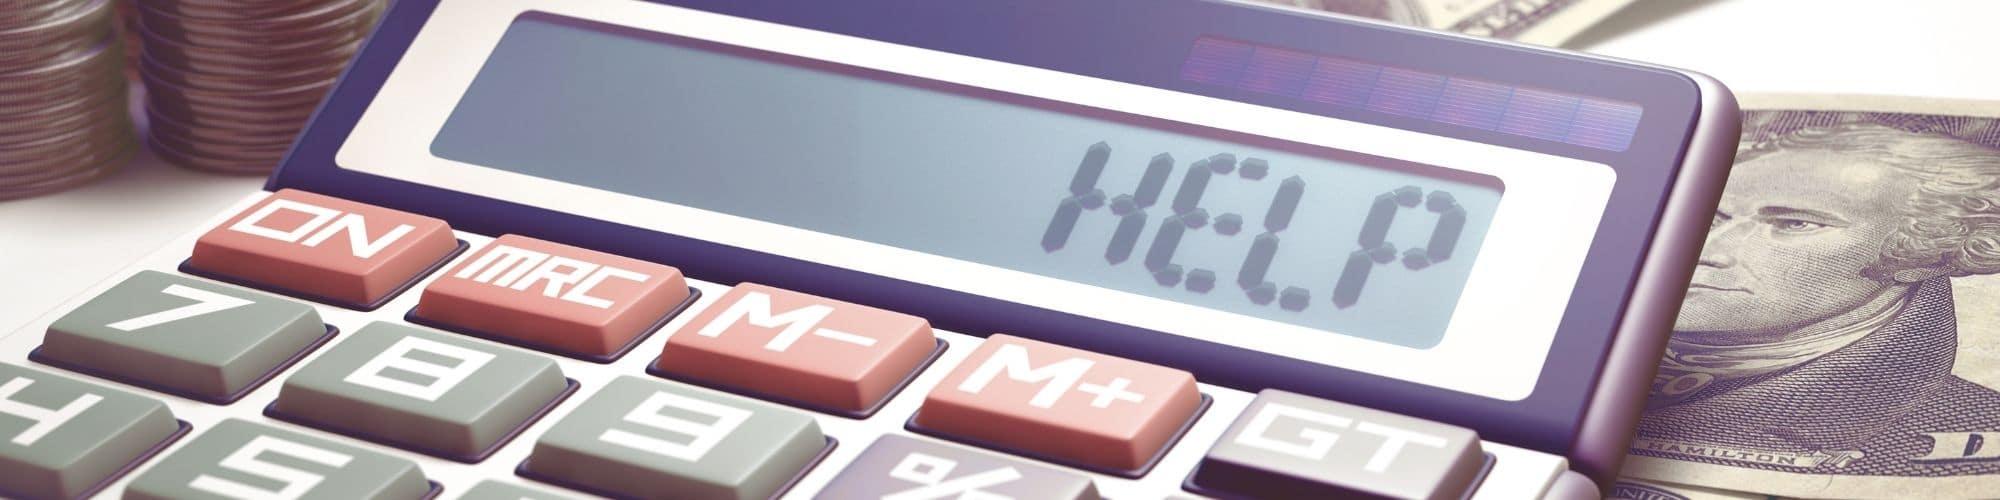 aides covid 19 frais fixes charges